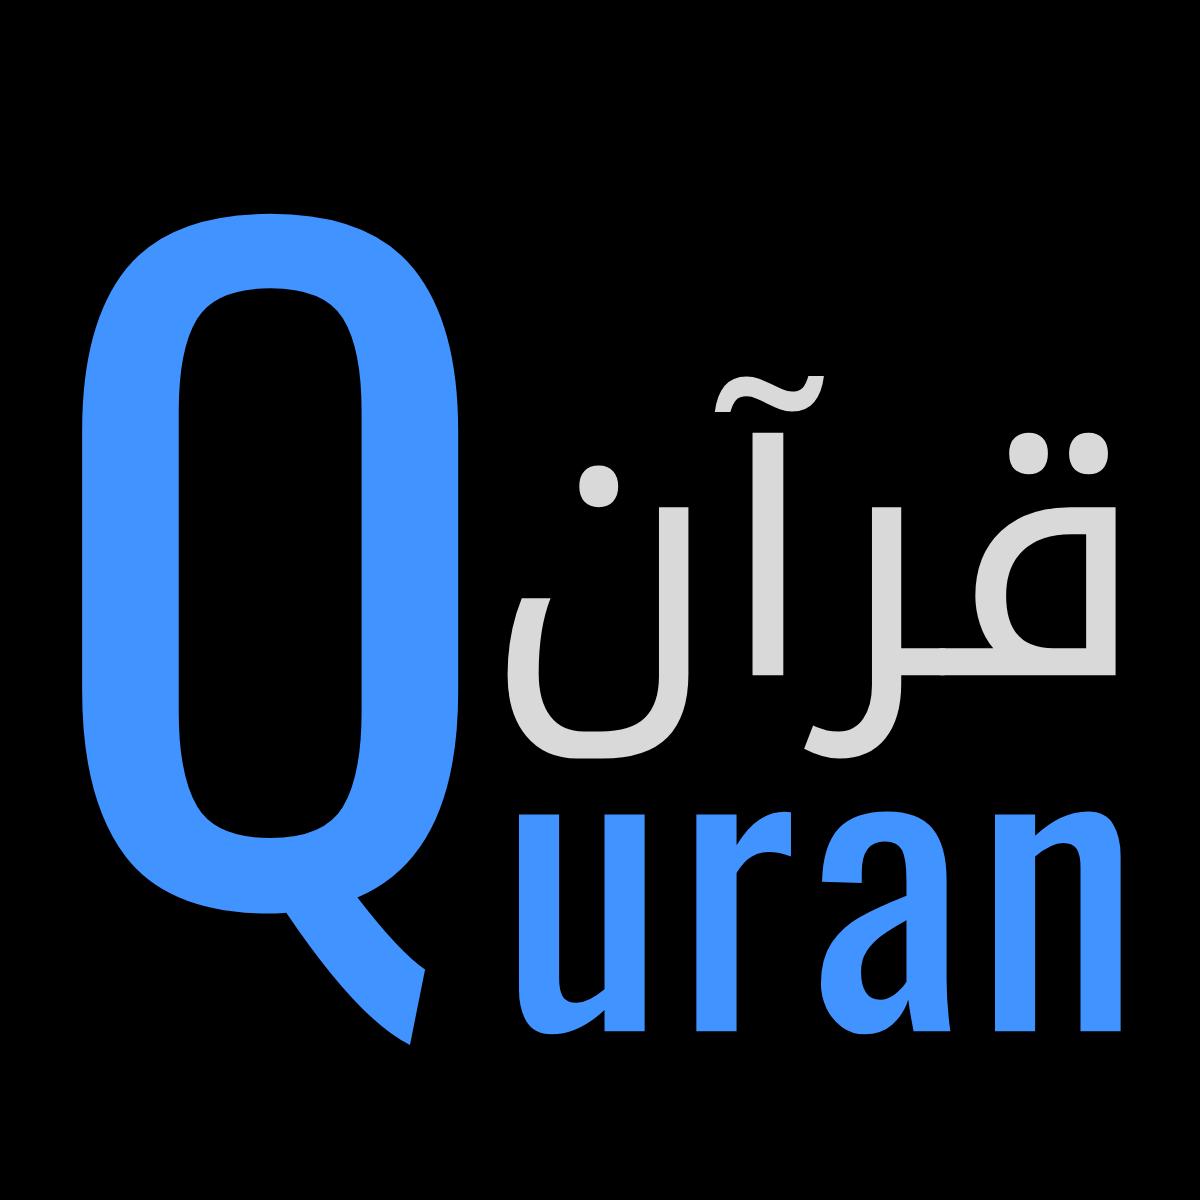 Quran in English and Arabic, with Recitations  القرآن الكريم